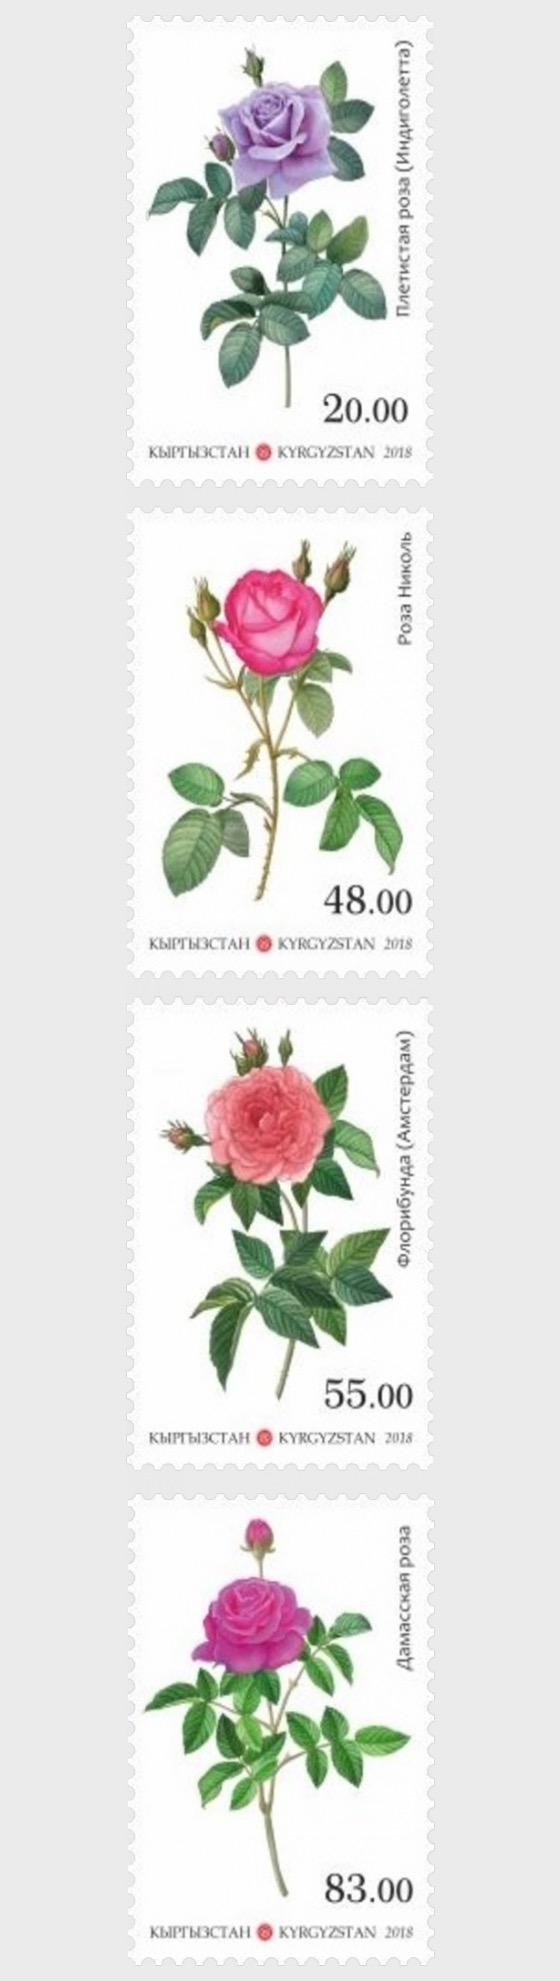 Flora of Kyrgyzstan - Roses - Set